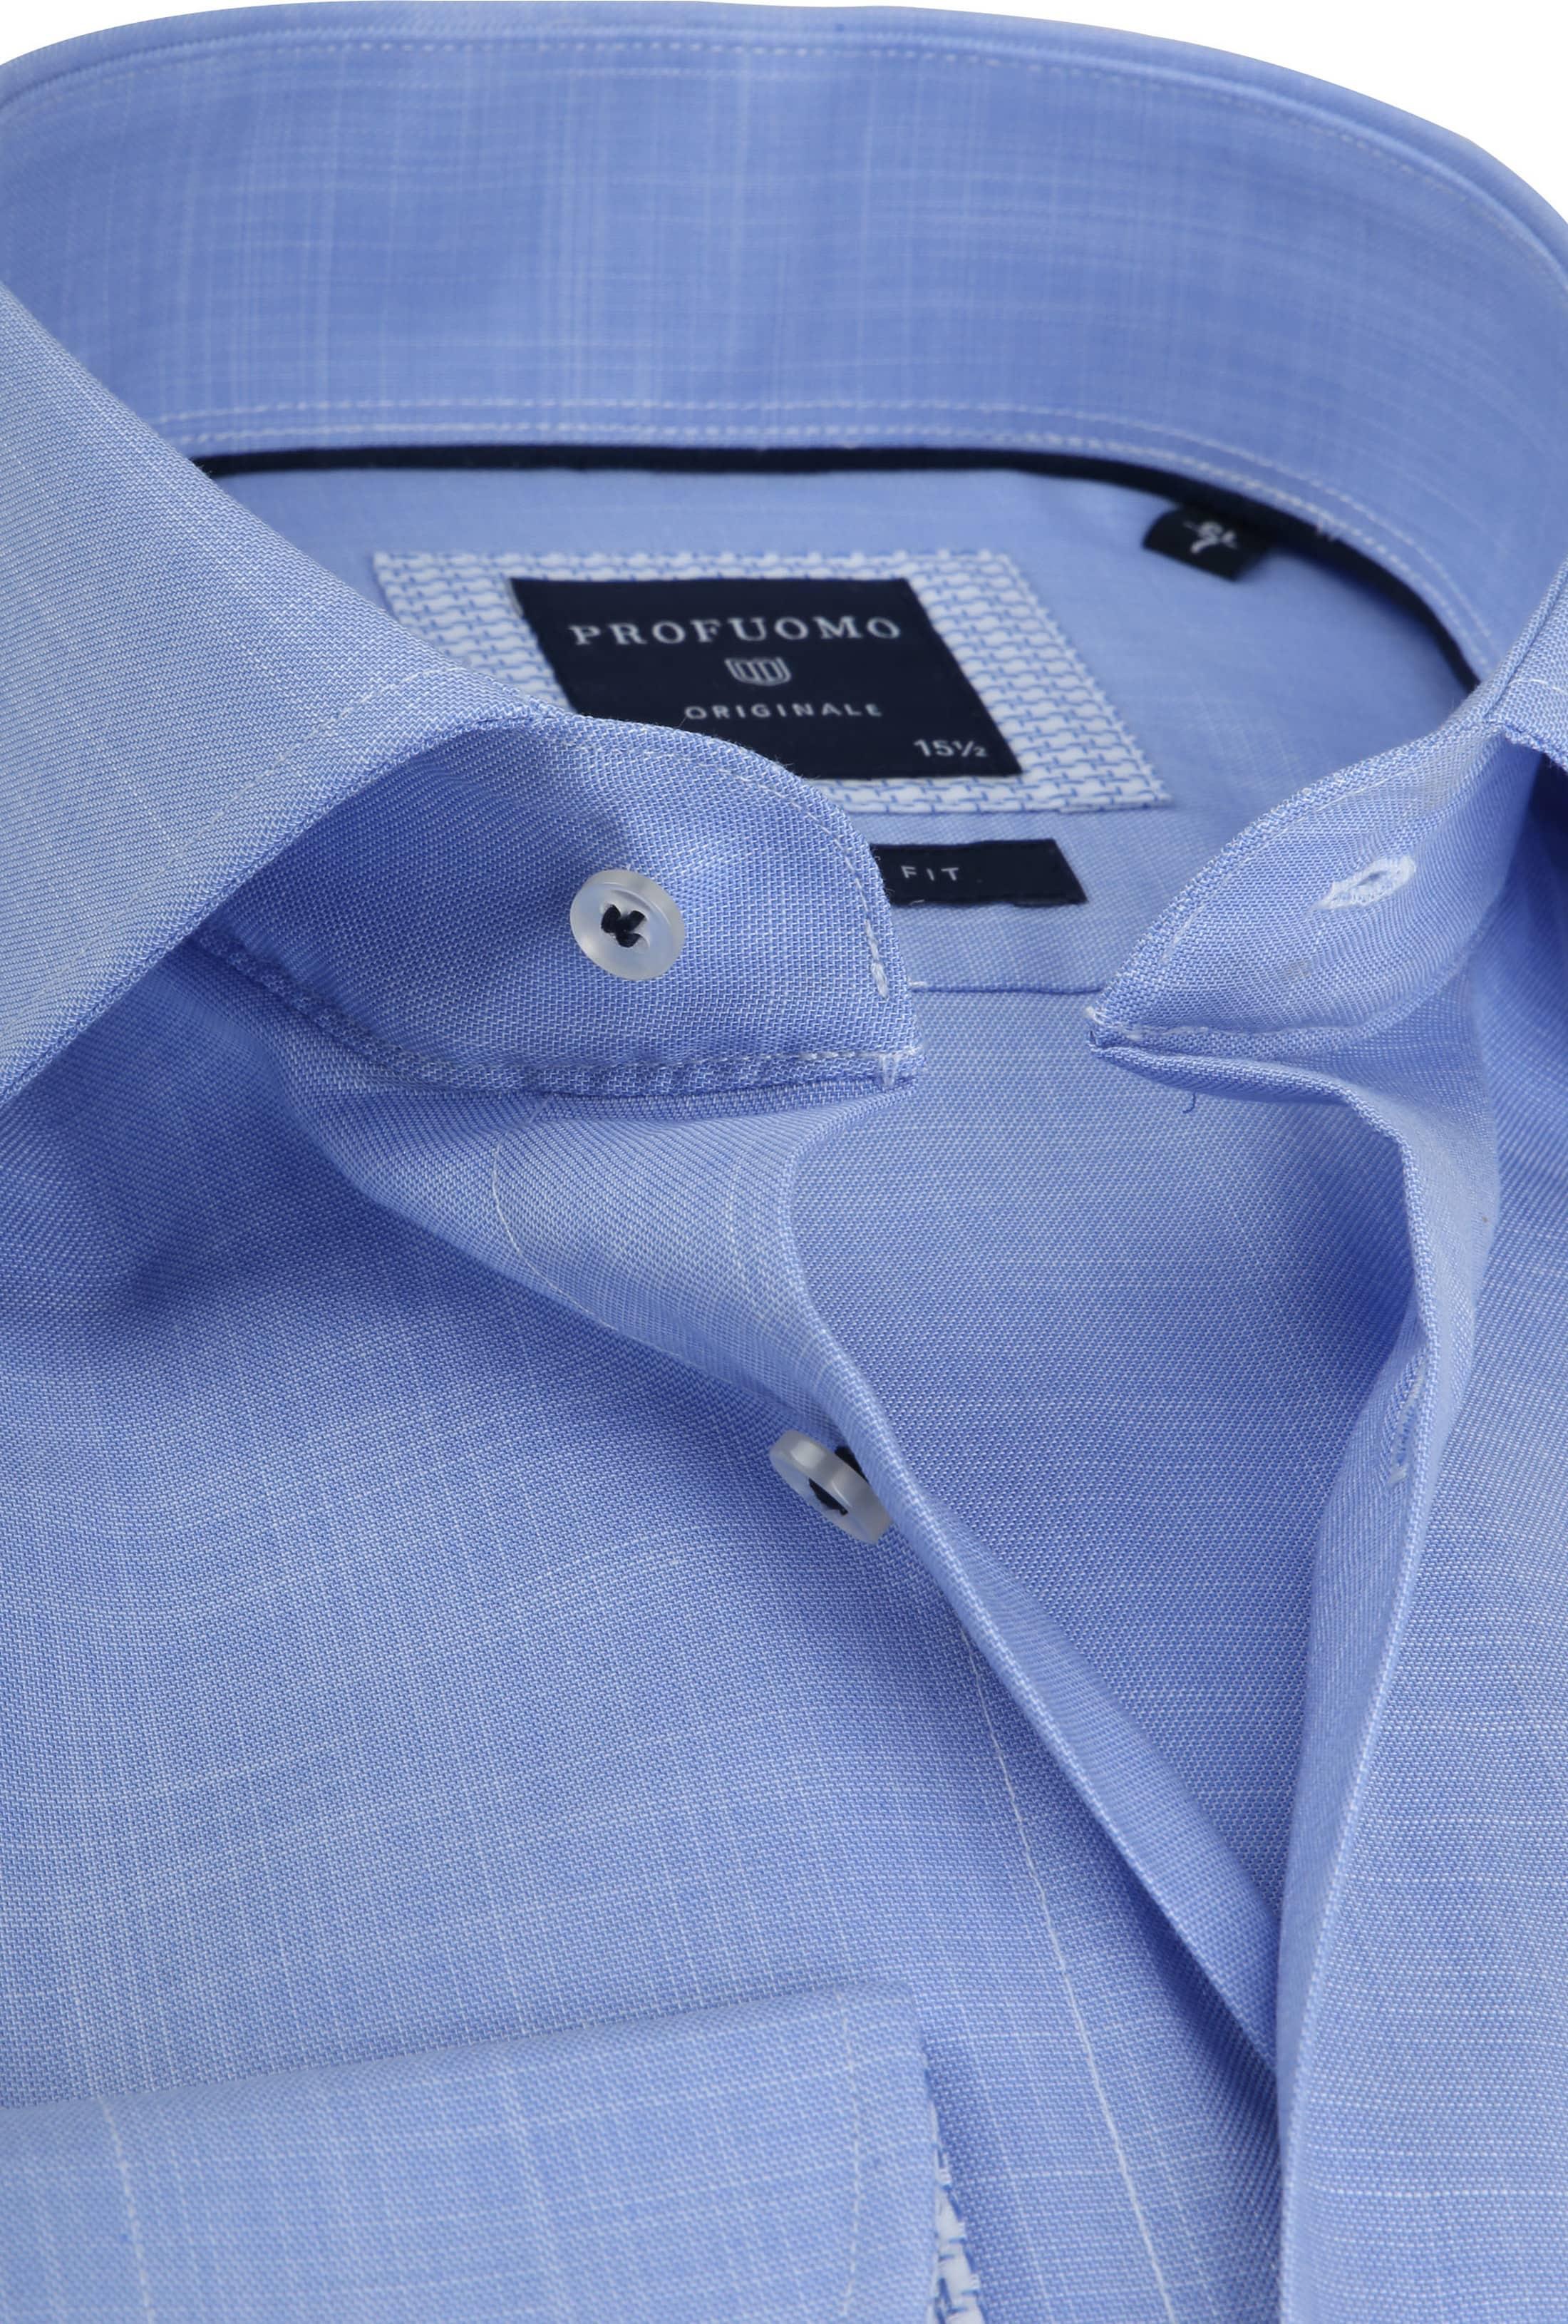 Profuomo Overhemd Melange Blauw SL7 foto 1